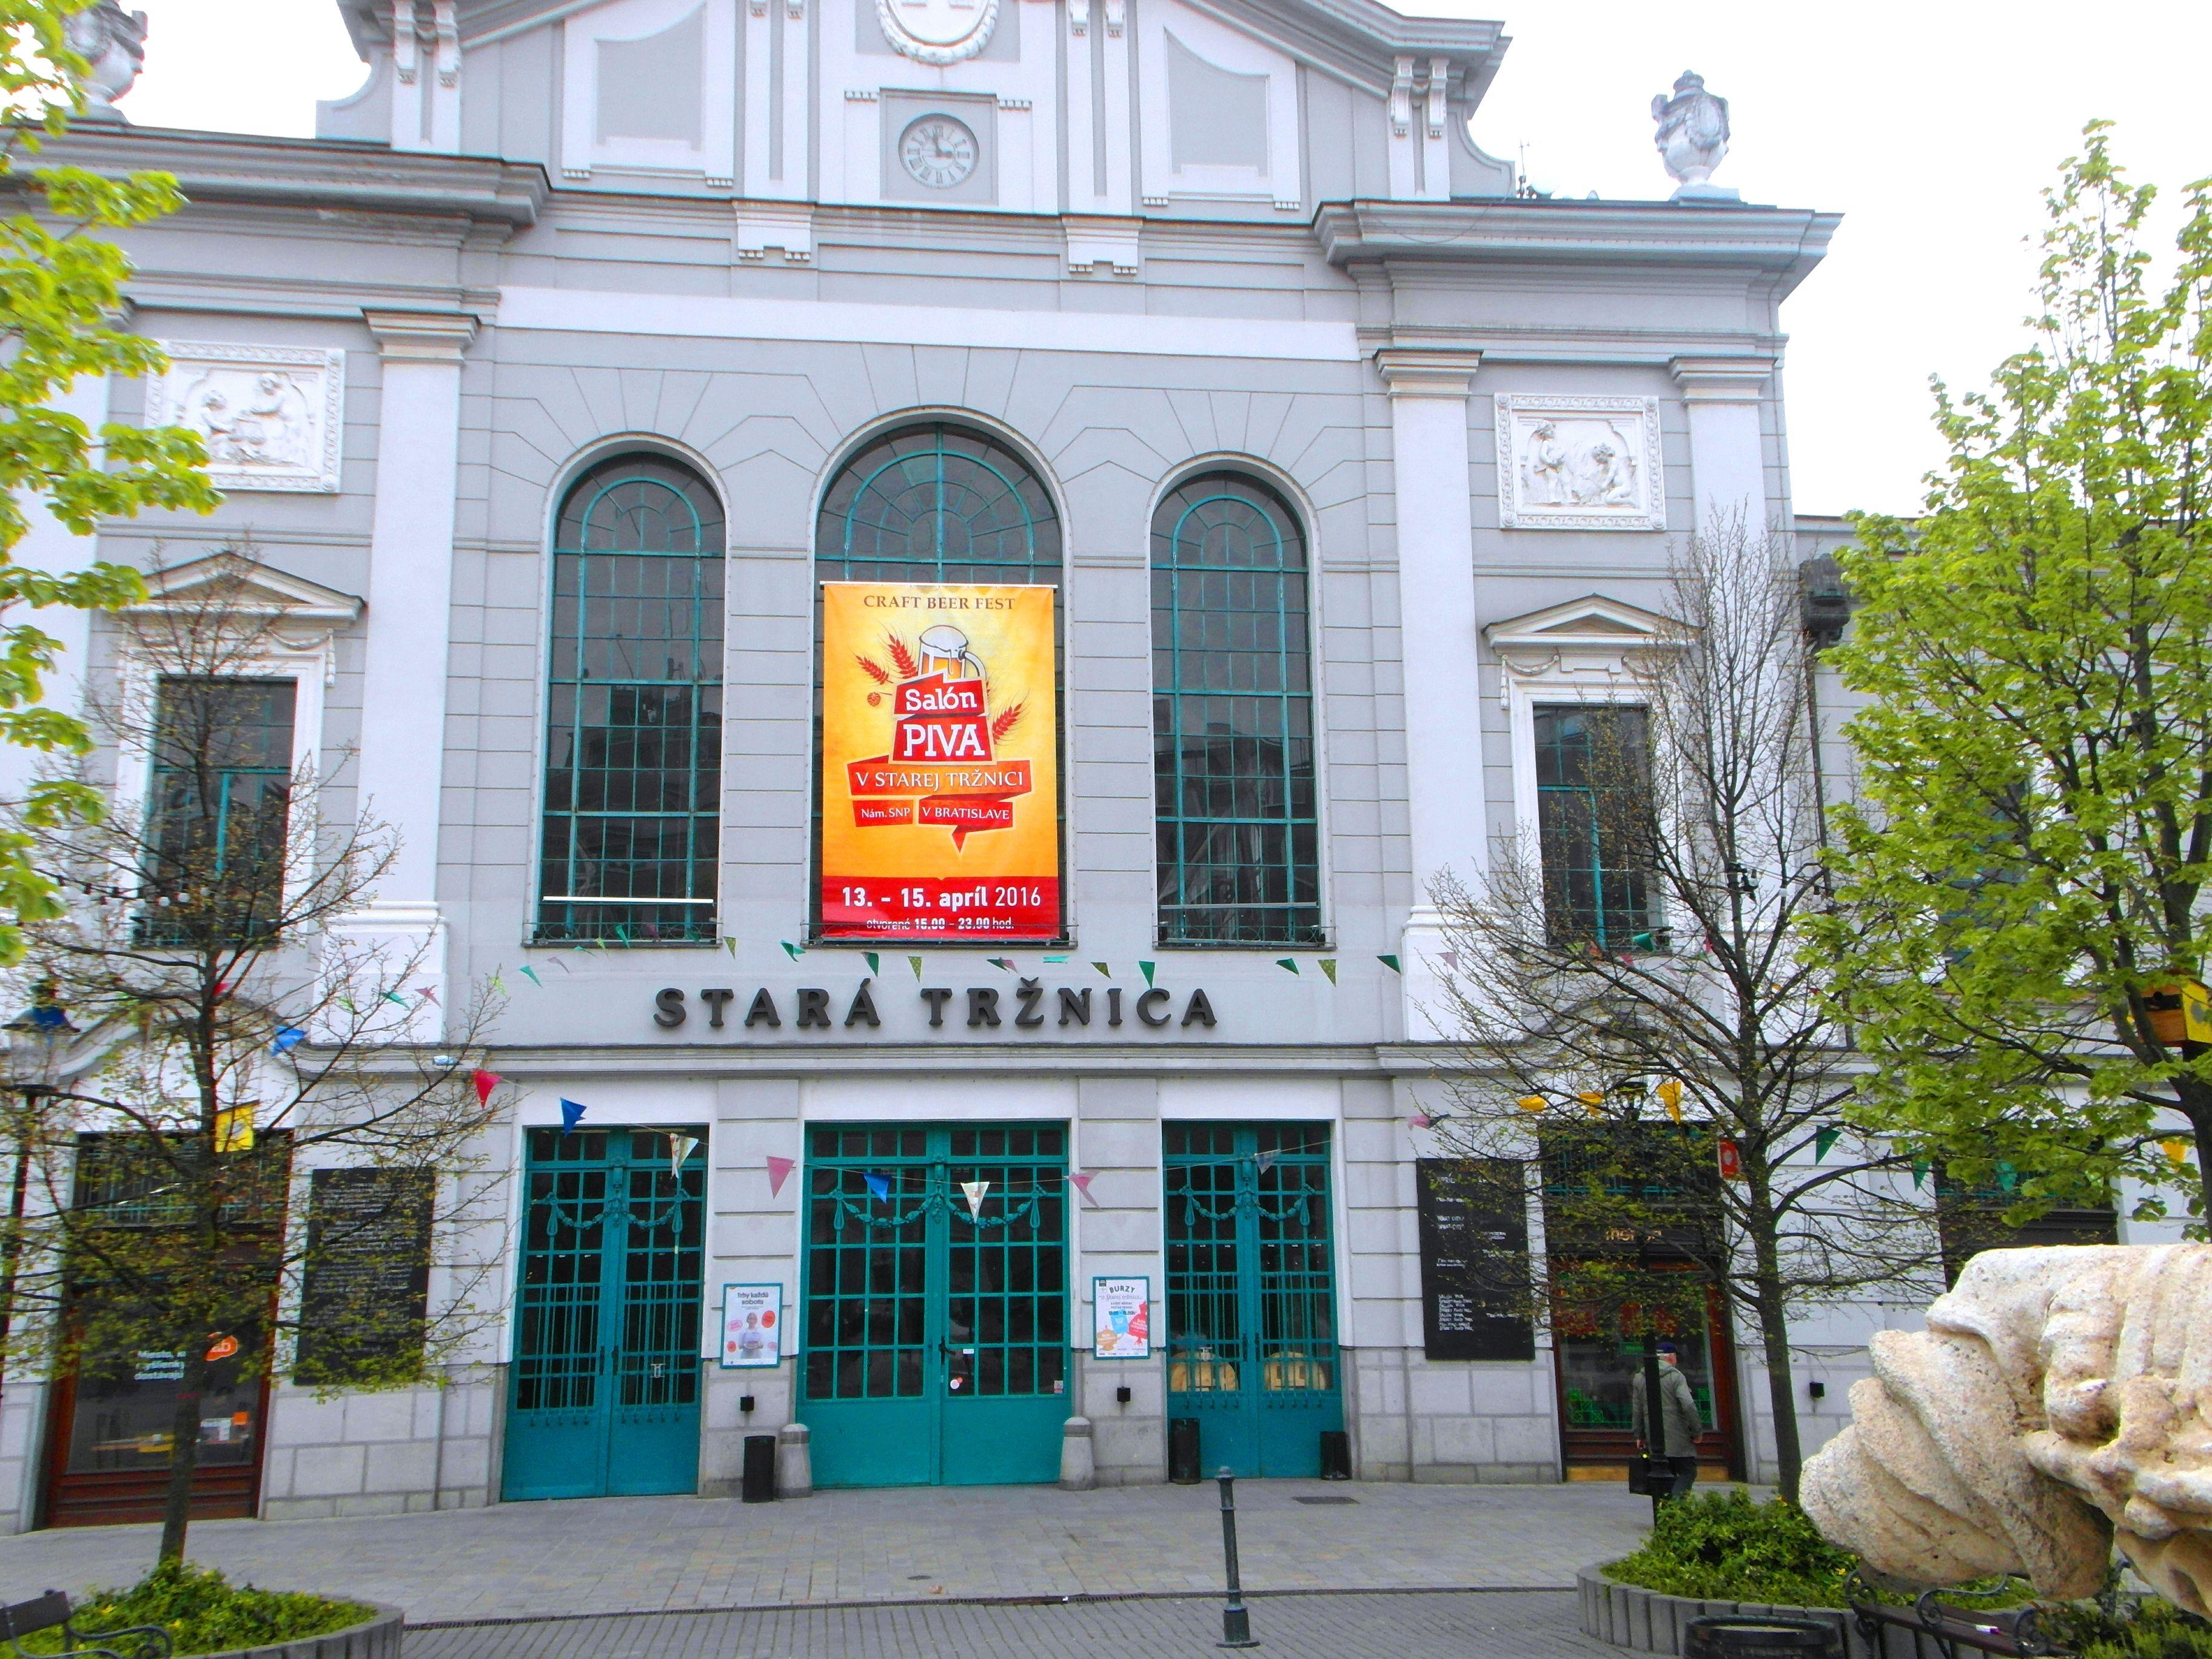 Salón Piva od zajtra v Starej Tržnici v Bratislave. Tešíte sa ? www.vinopredaj.sk  #salonpiva #trznica #bratislava #craft #beer #pivo #cerveza #bier #staratrznica #salon #piva #fest